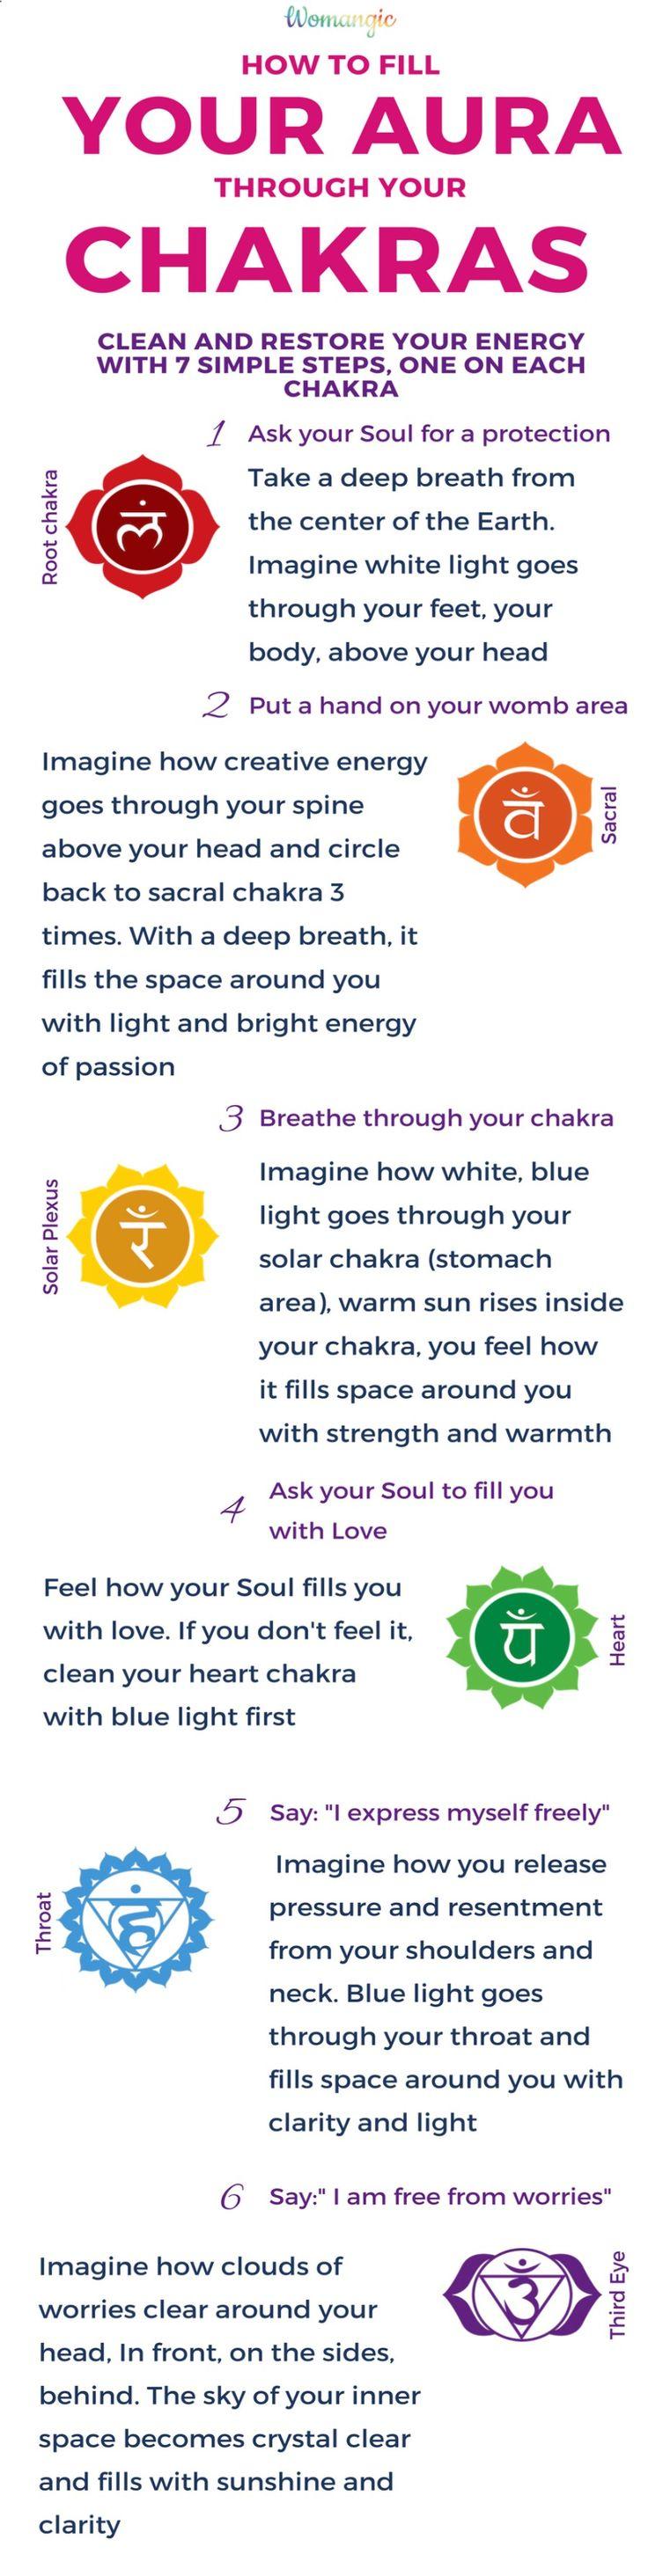 The 25 best reiki symbols meaning ideas on pinterest reiki reiki symbols how to fill your aura through chakras chakra chakra balancing root sacral solar plexus heart throat third eye crown chakra meaning buycottarizona